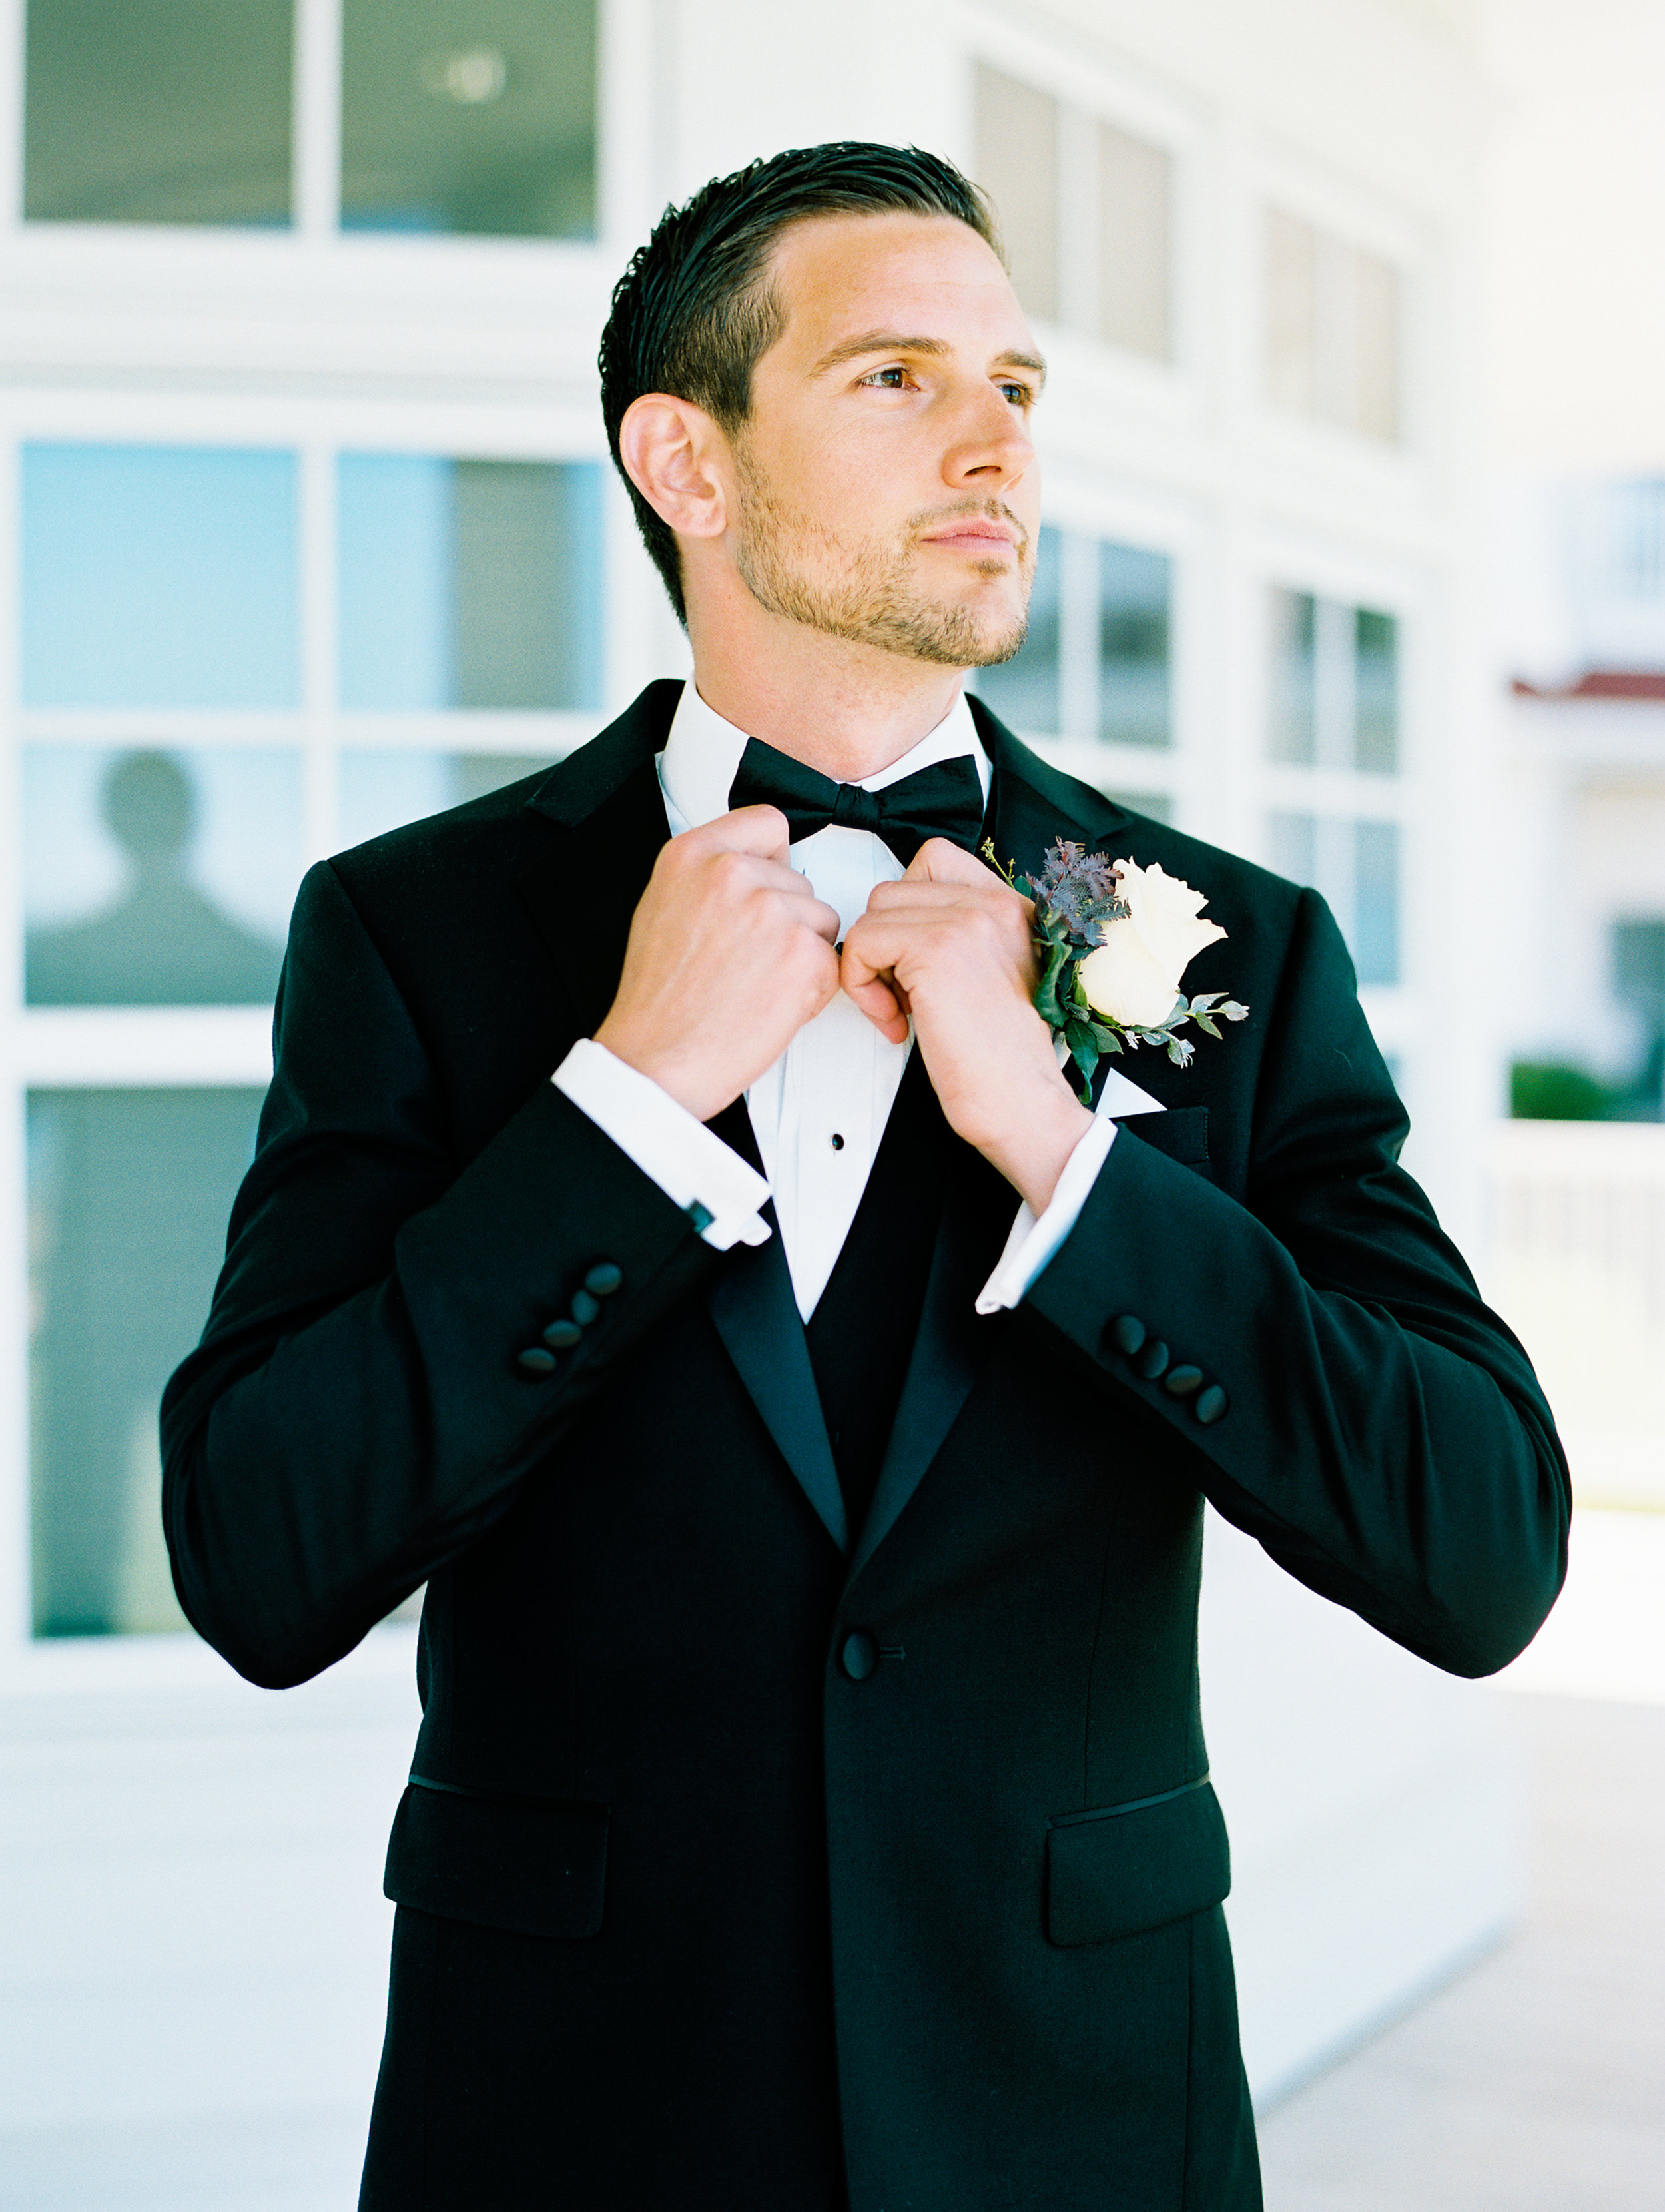 Noss+Wedding+Groom+Groomsmen-29.jpg